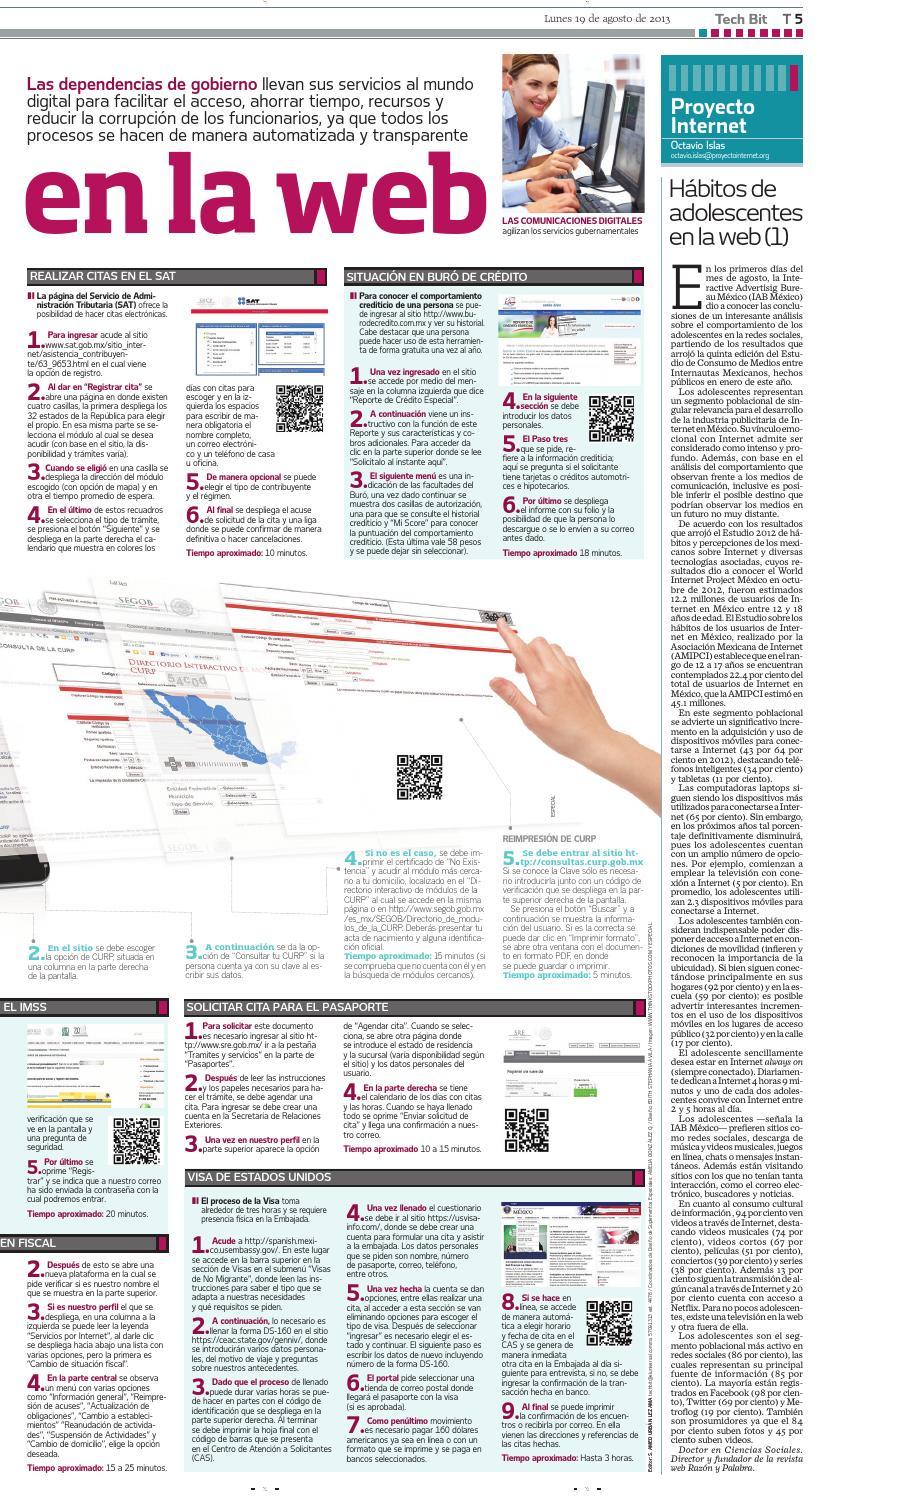 Portadas Tech Bit El Universal 2013 By Portafolio Abraham